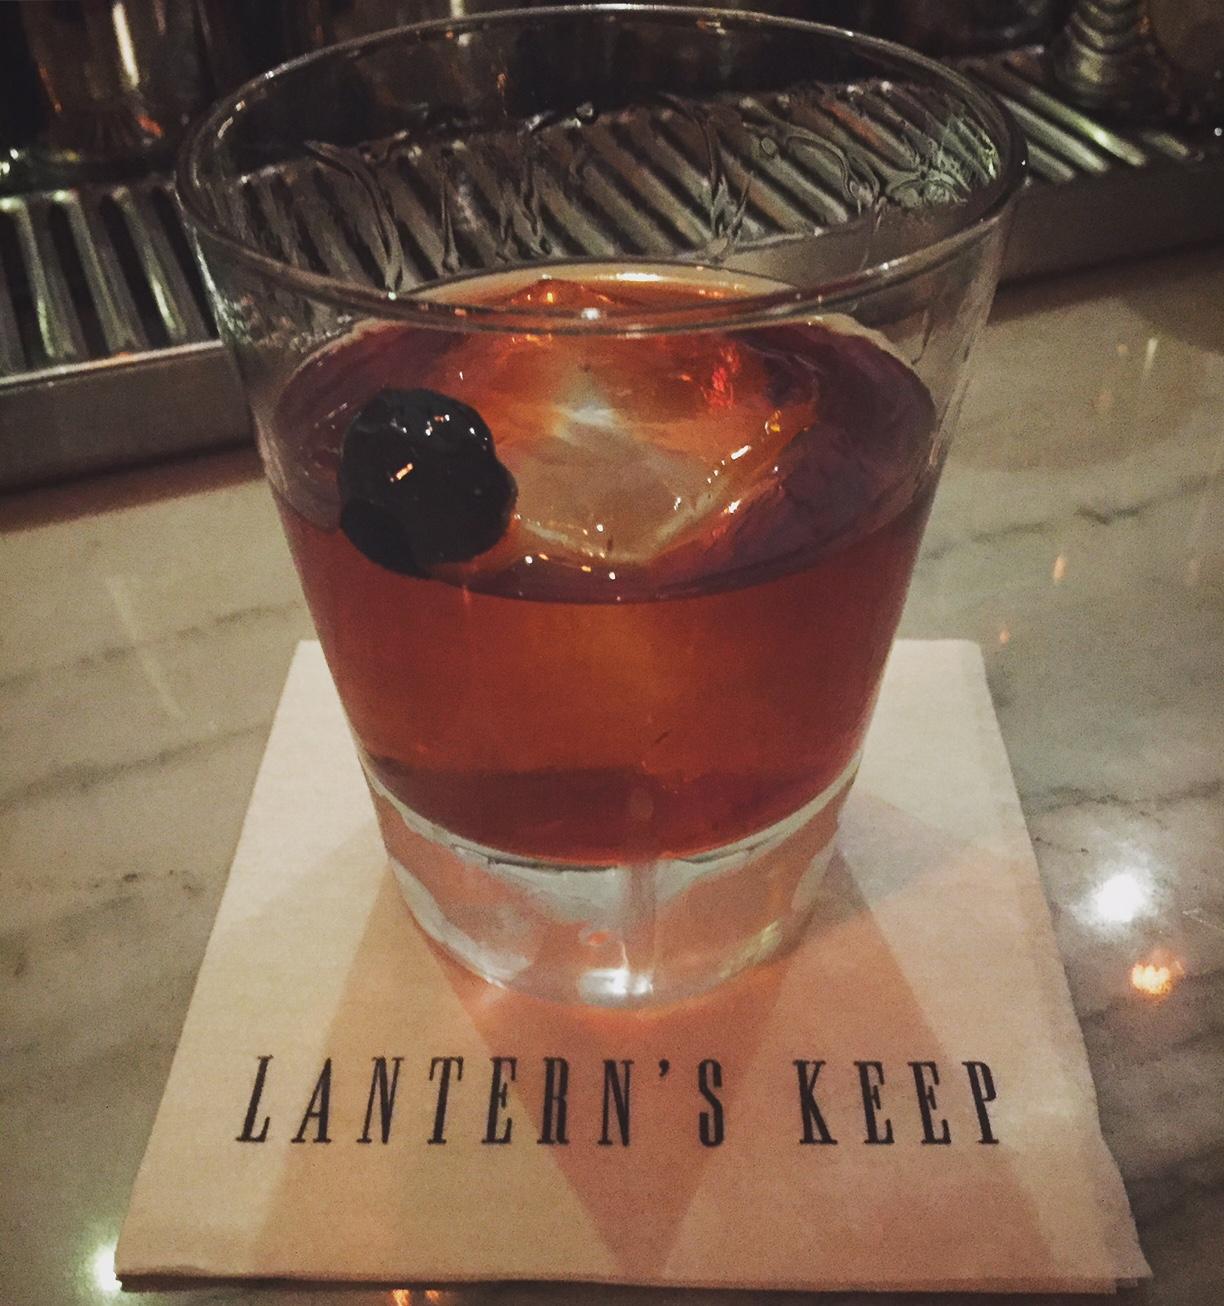 Right Hand at Lantern's Keep